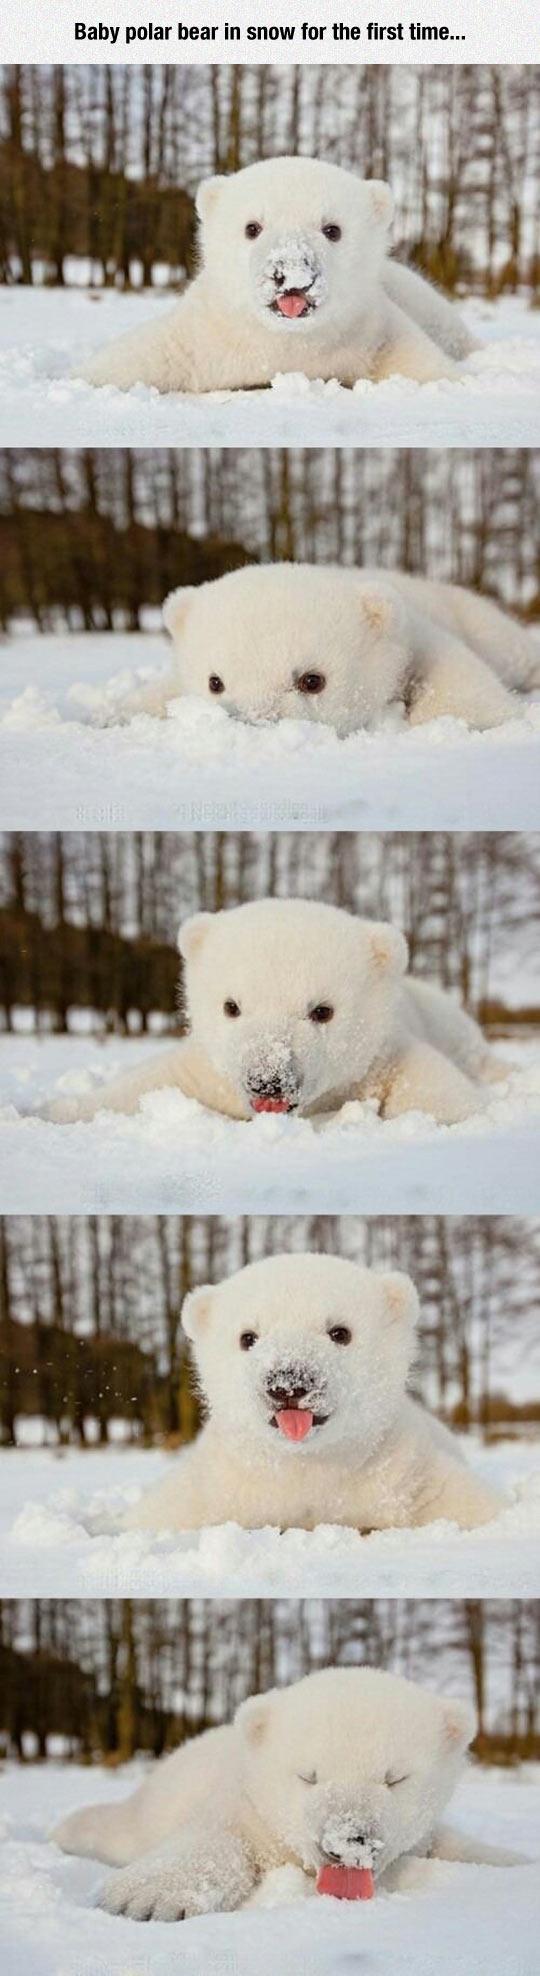 Enjoying The Snow